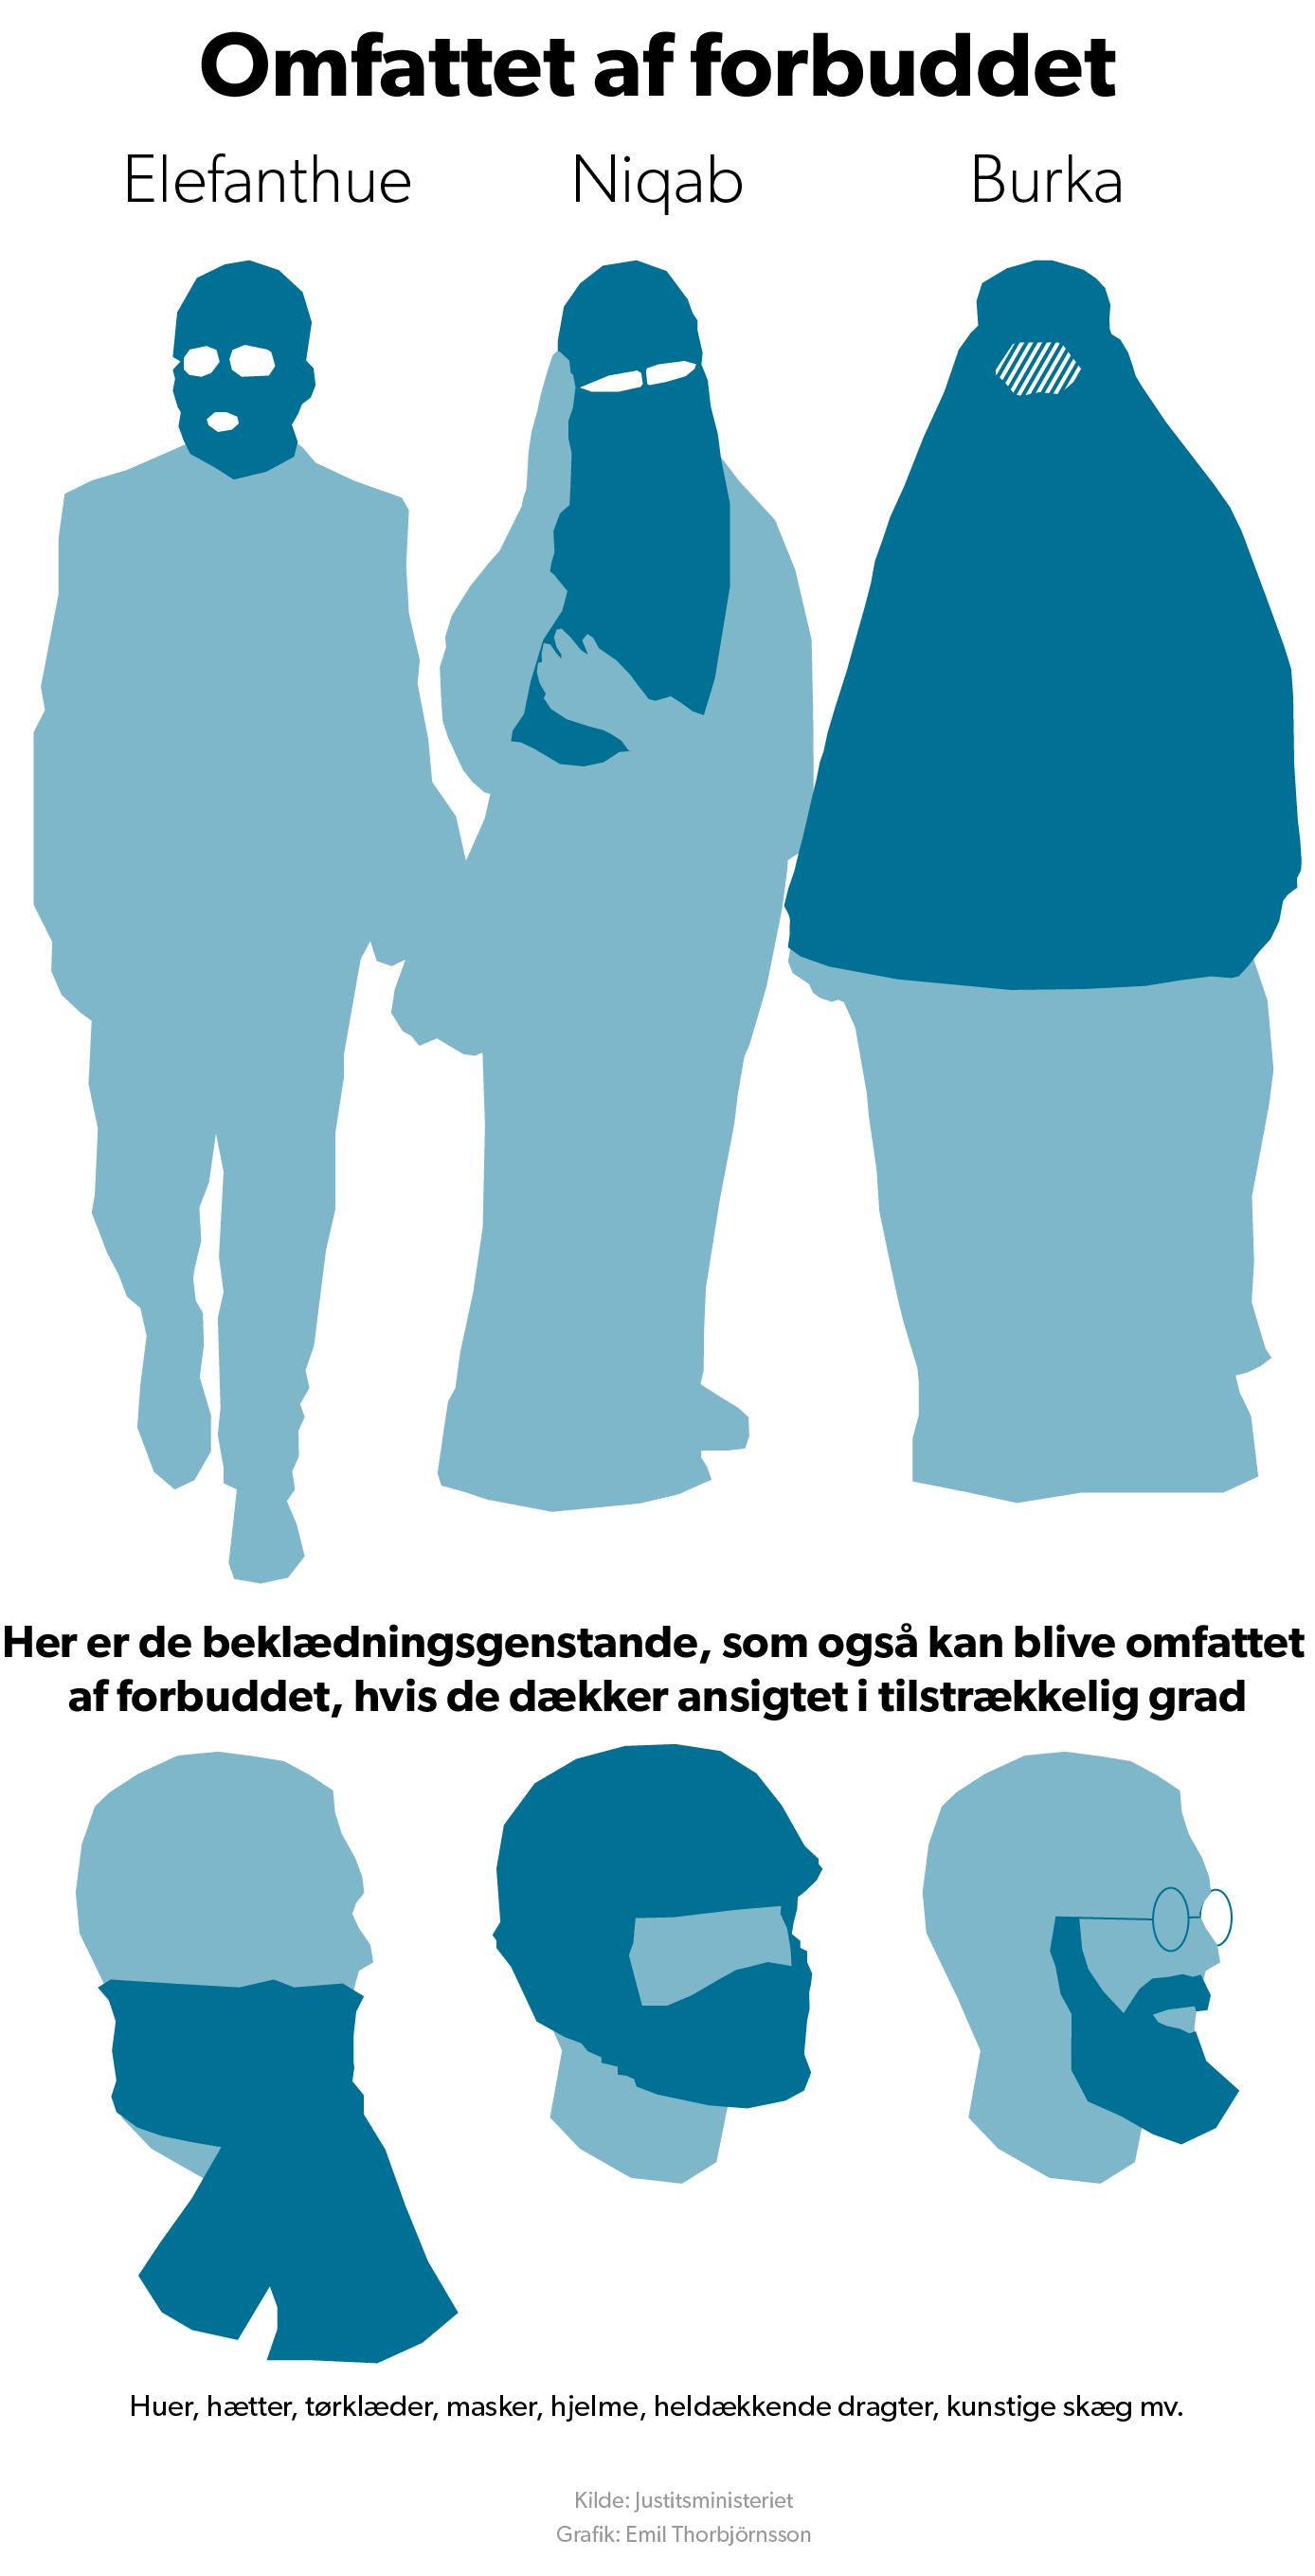 burka-desktop-2.png